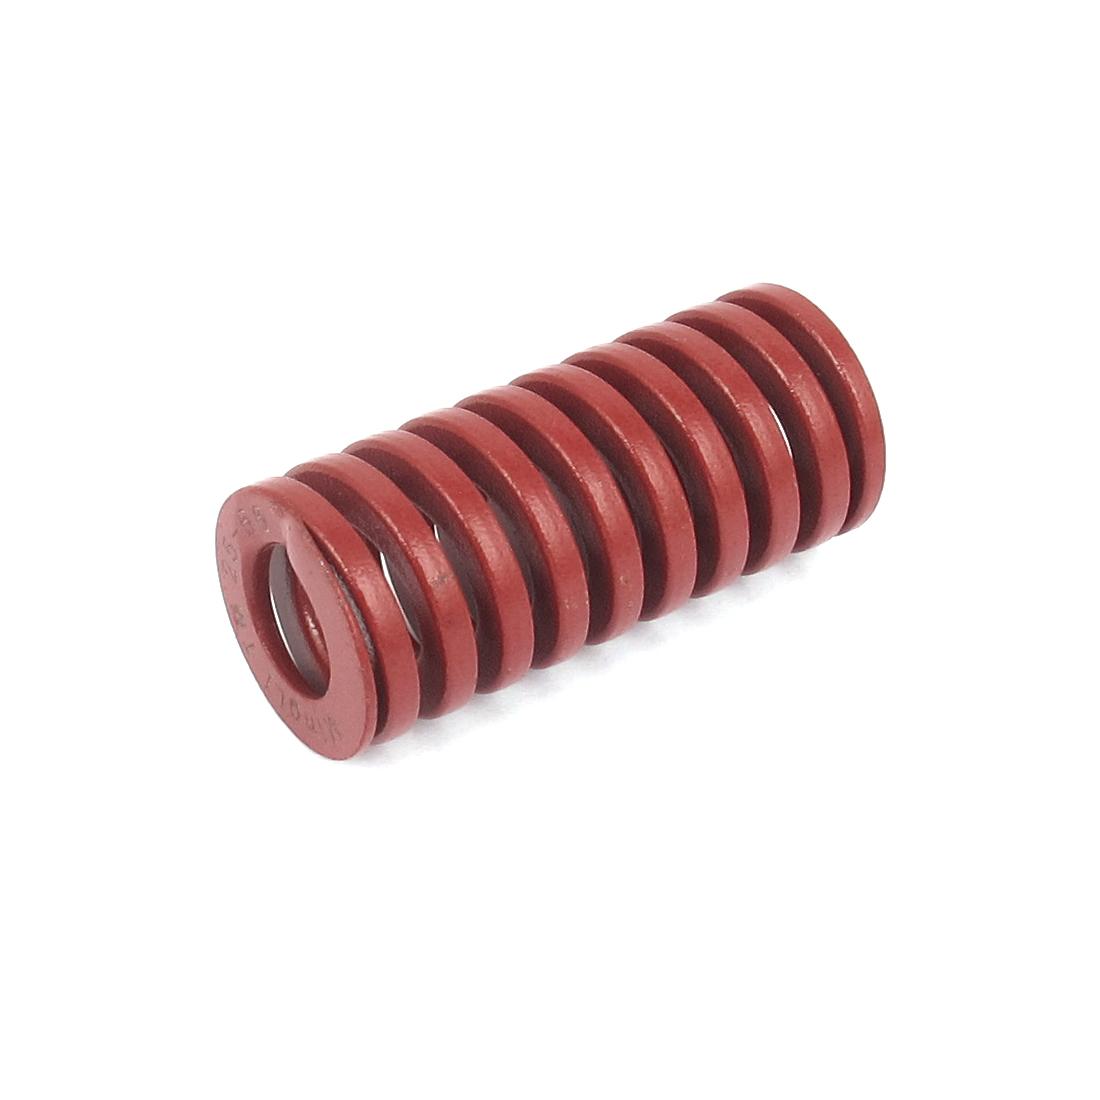 25mm OD 55mm Long Medium Load Spiral Stamping Compression Die Spring Red